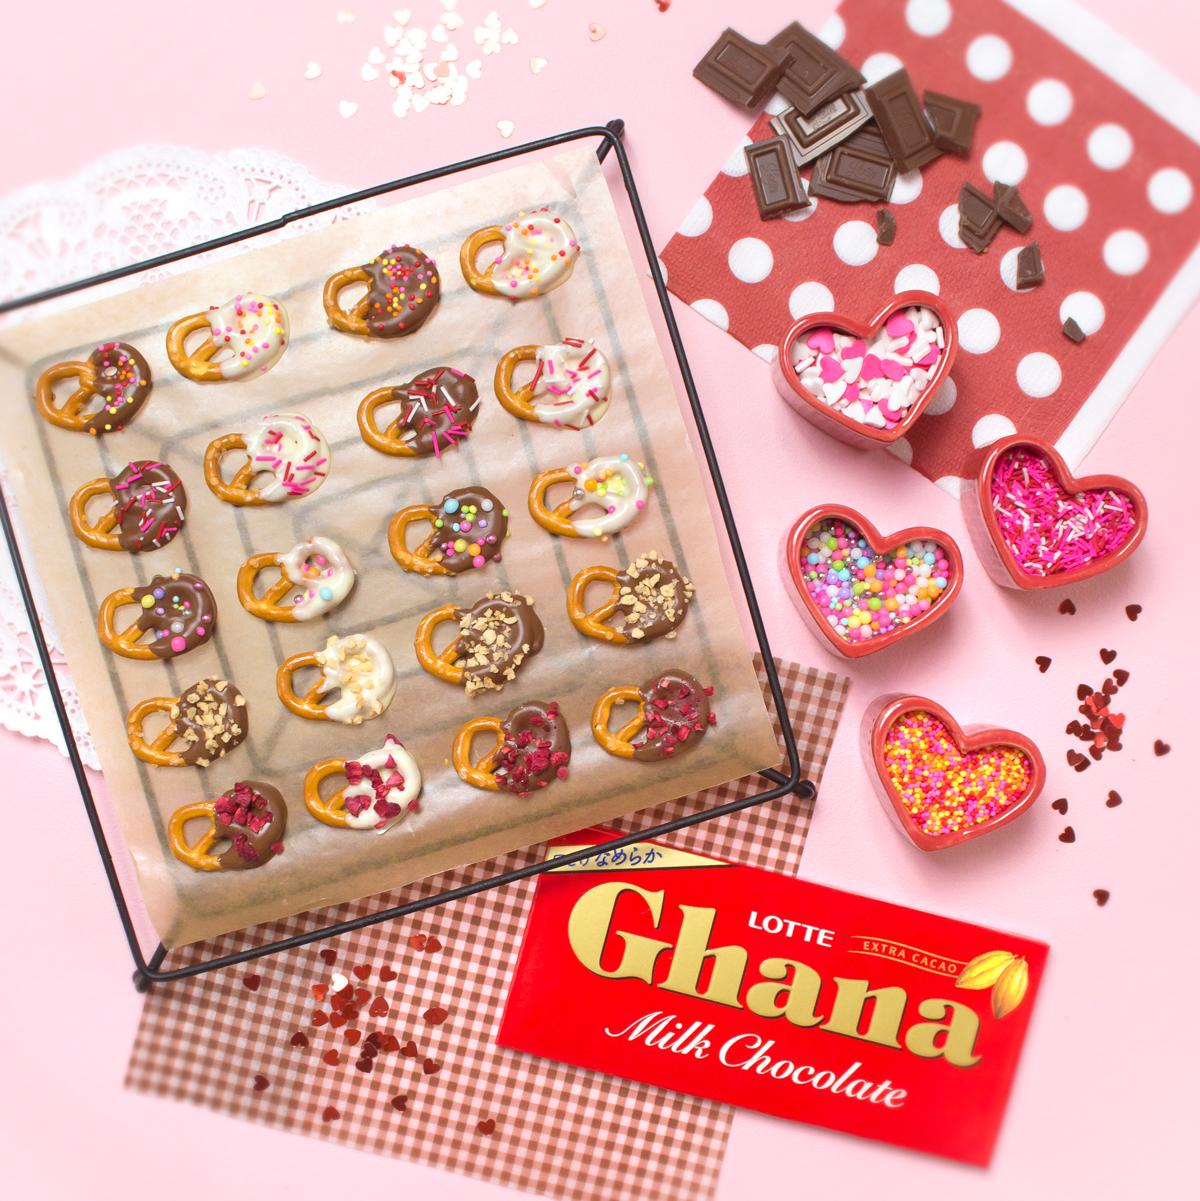 <center>ガーナで手づくりバレンタイン♡イベント出演記念チョコレートプレッツェルの作り方 <br><small>Ghana Milk Chocolate Pretzel</small></center>